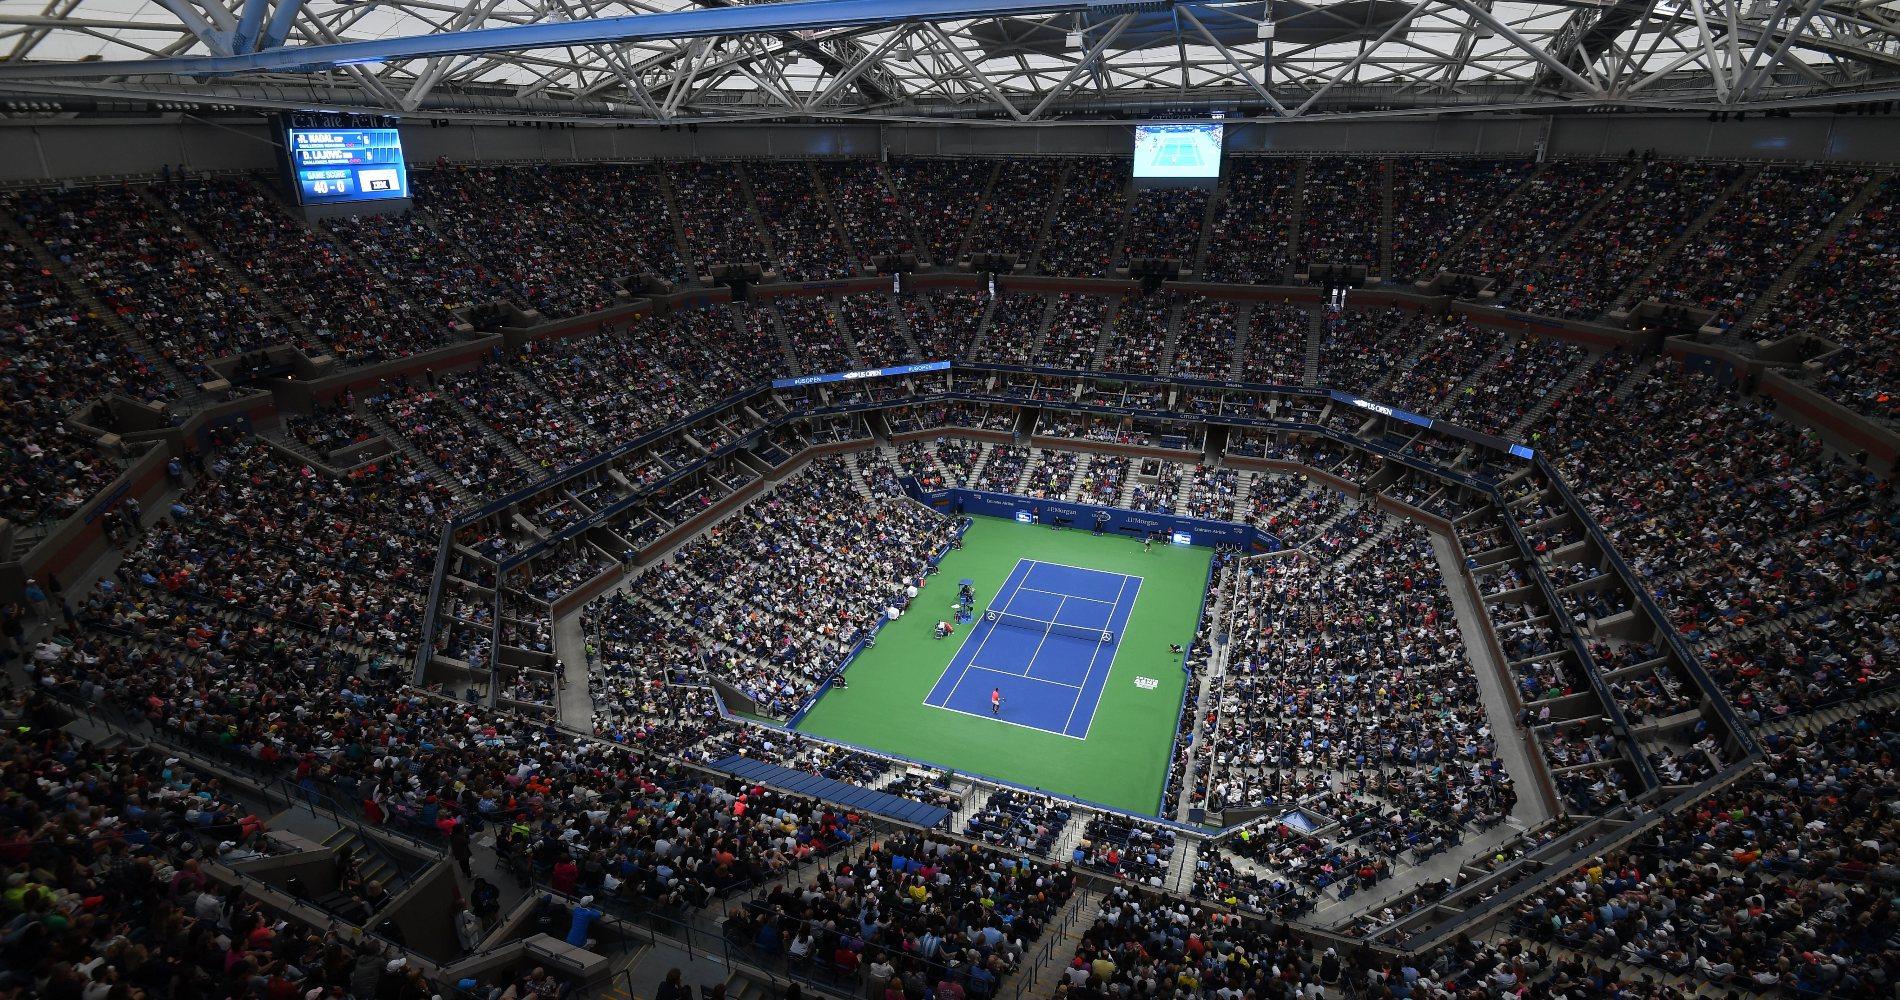 US Open, Billie Jean King Center